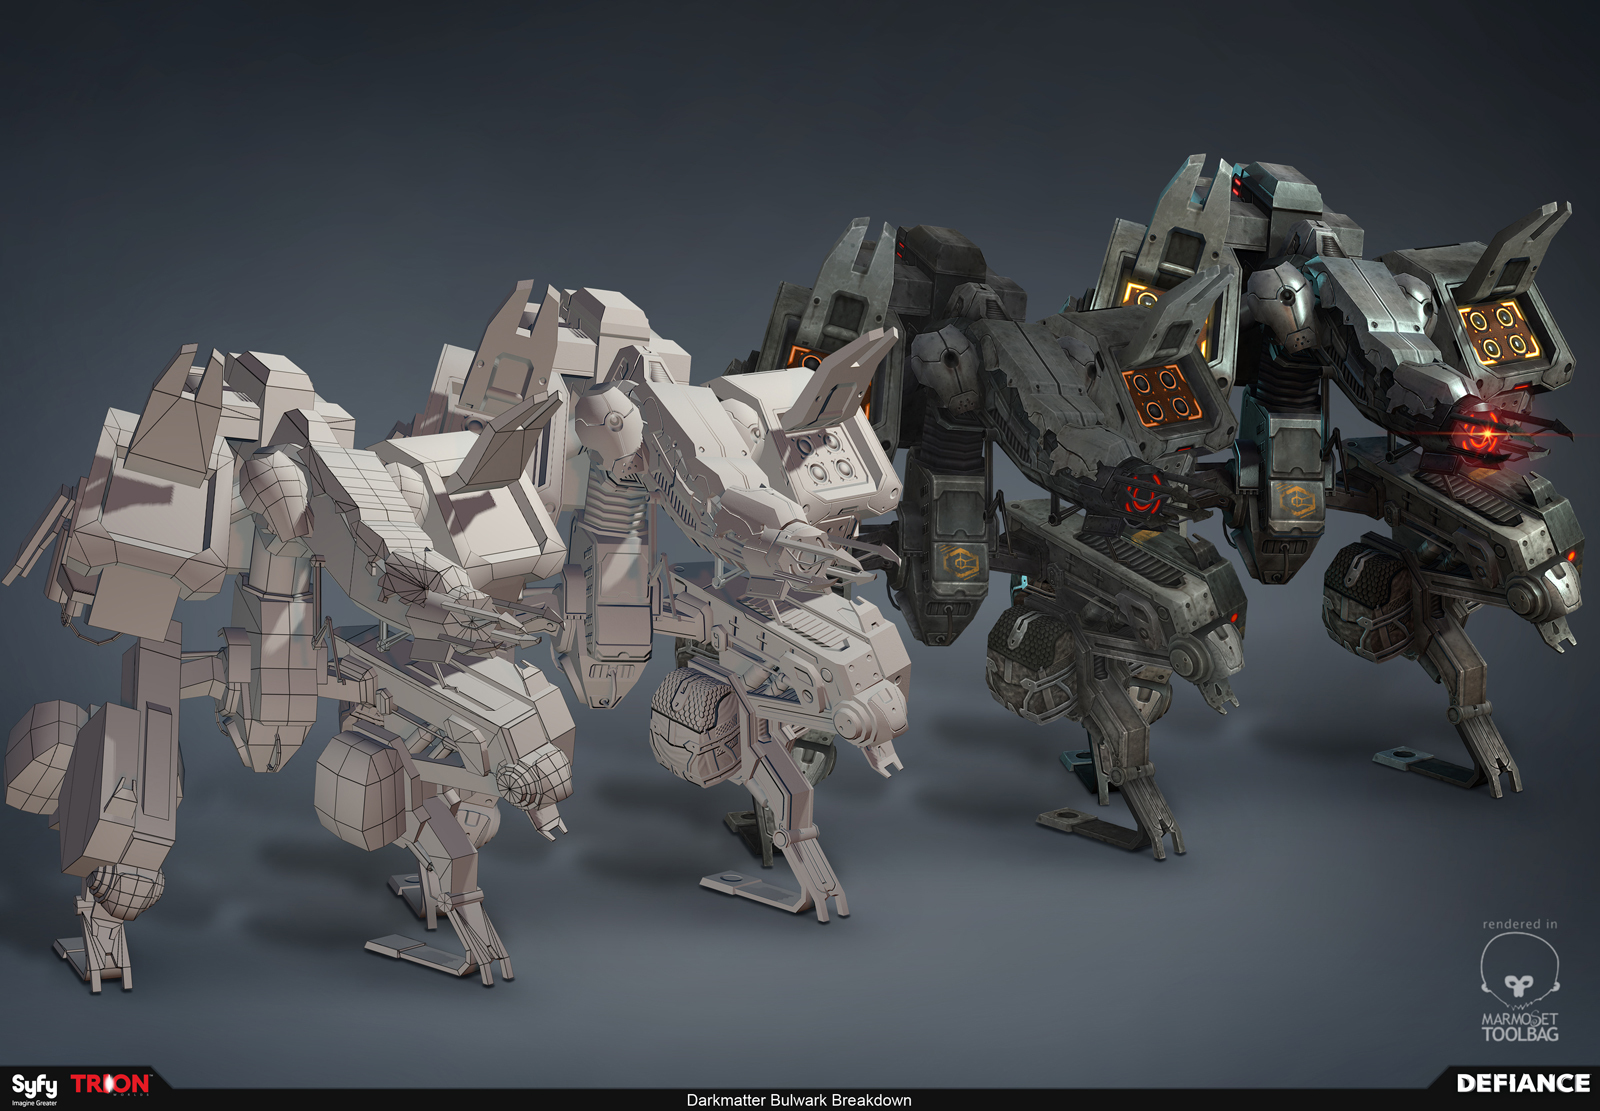 Npc darkmatter bulwark breakdown